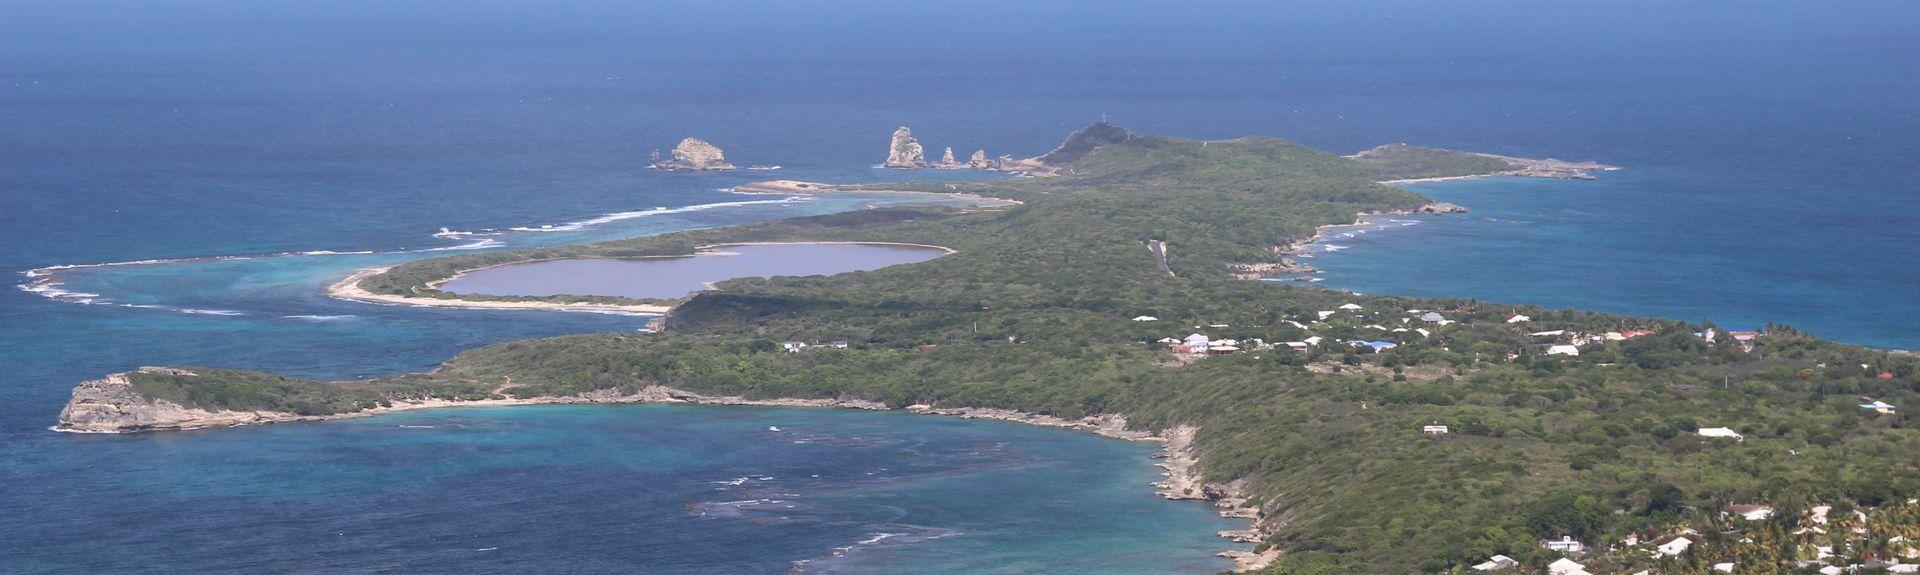 Golf International de Saint-François (Golfplatz), Saint-François, Grande-Terre, Guadeloupe